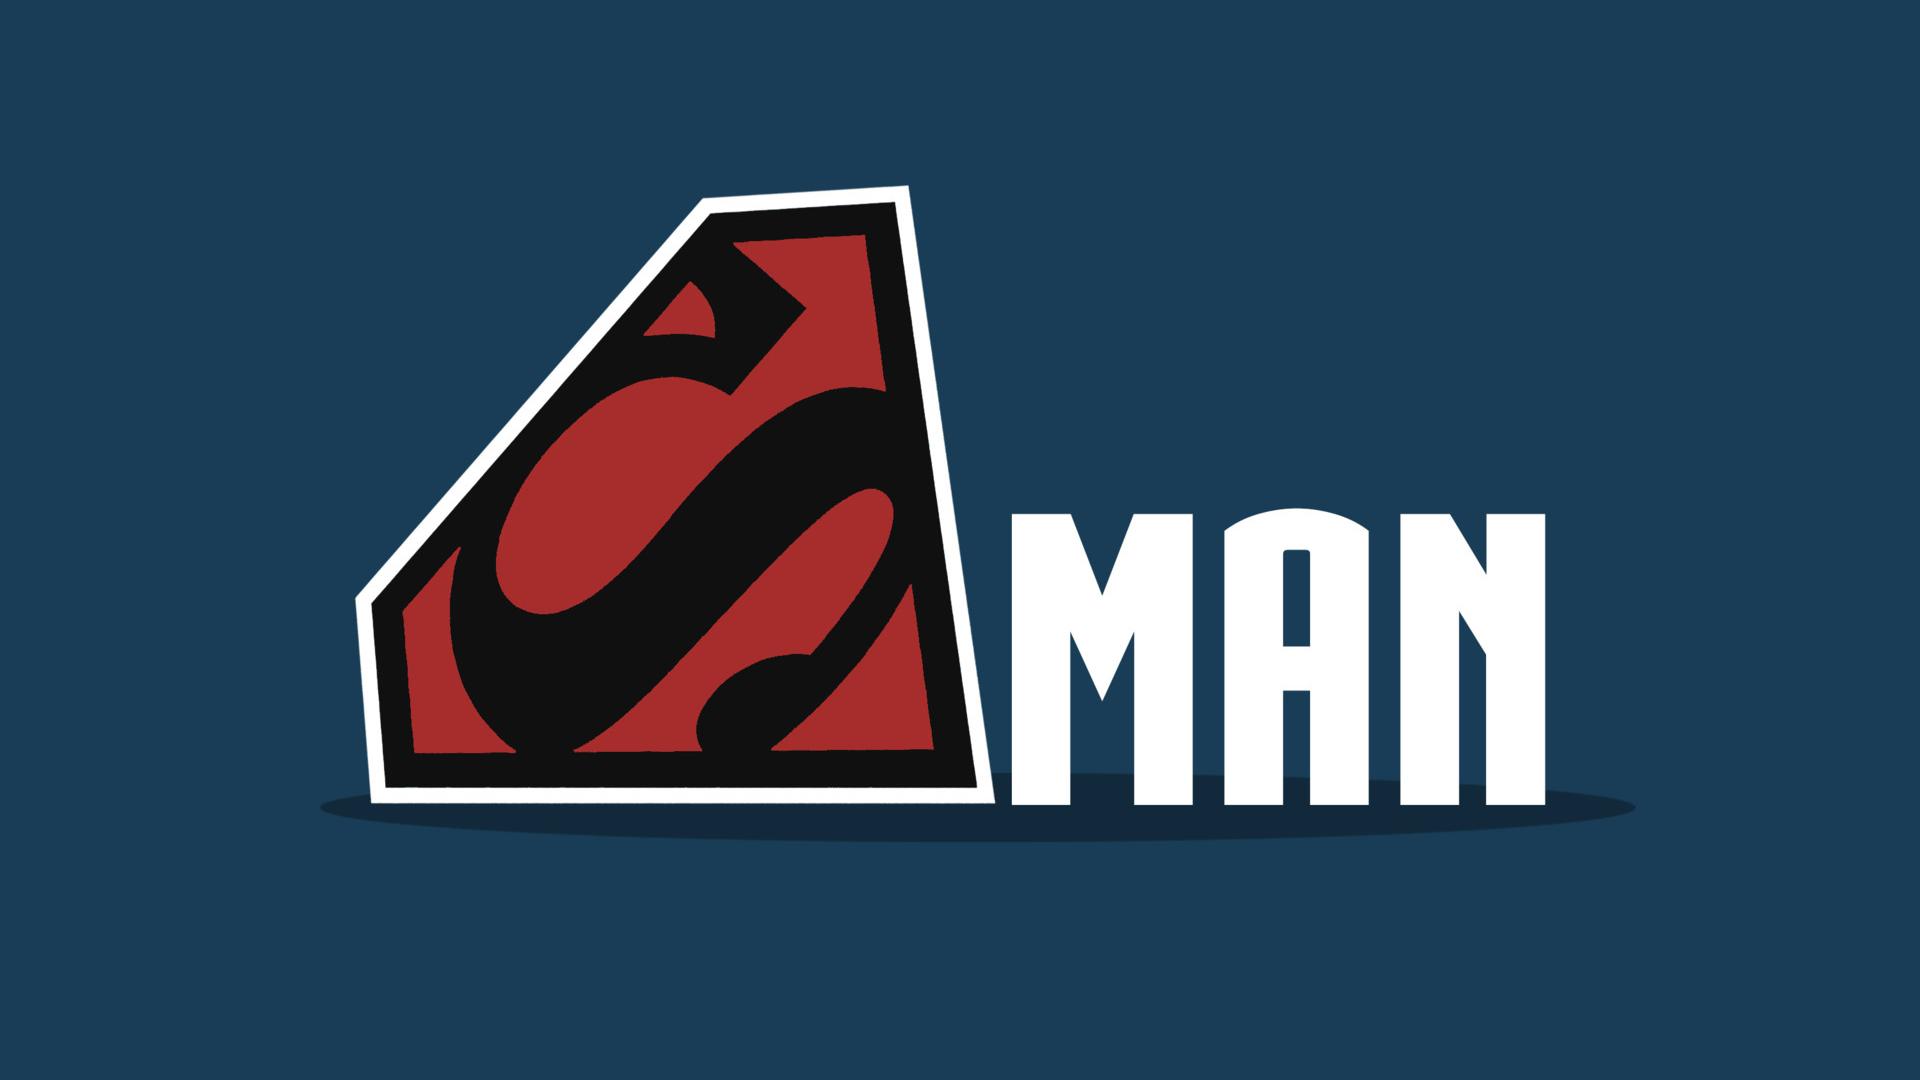 1920x1080 superman logo minimalism laptop full hd 1080p hd 4k superman logo minimalism e3g voltagebd Gallery